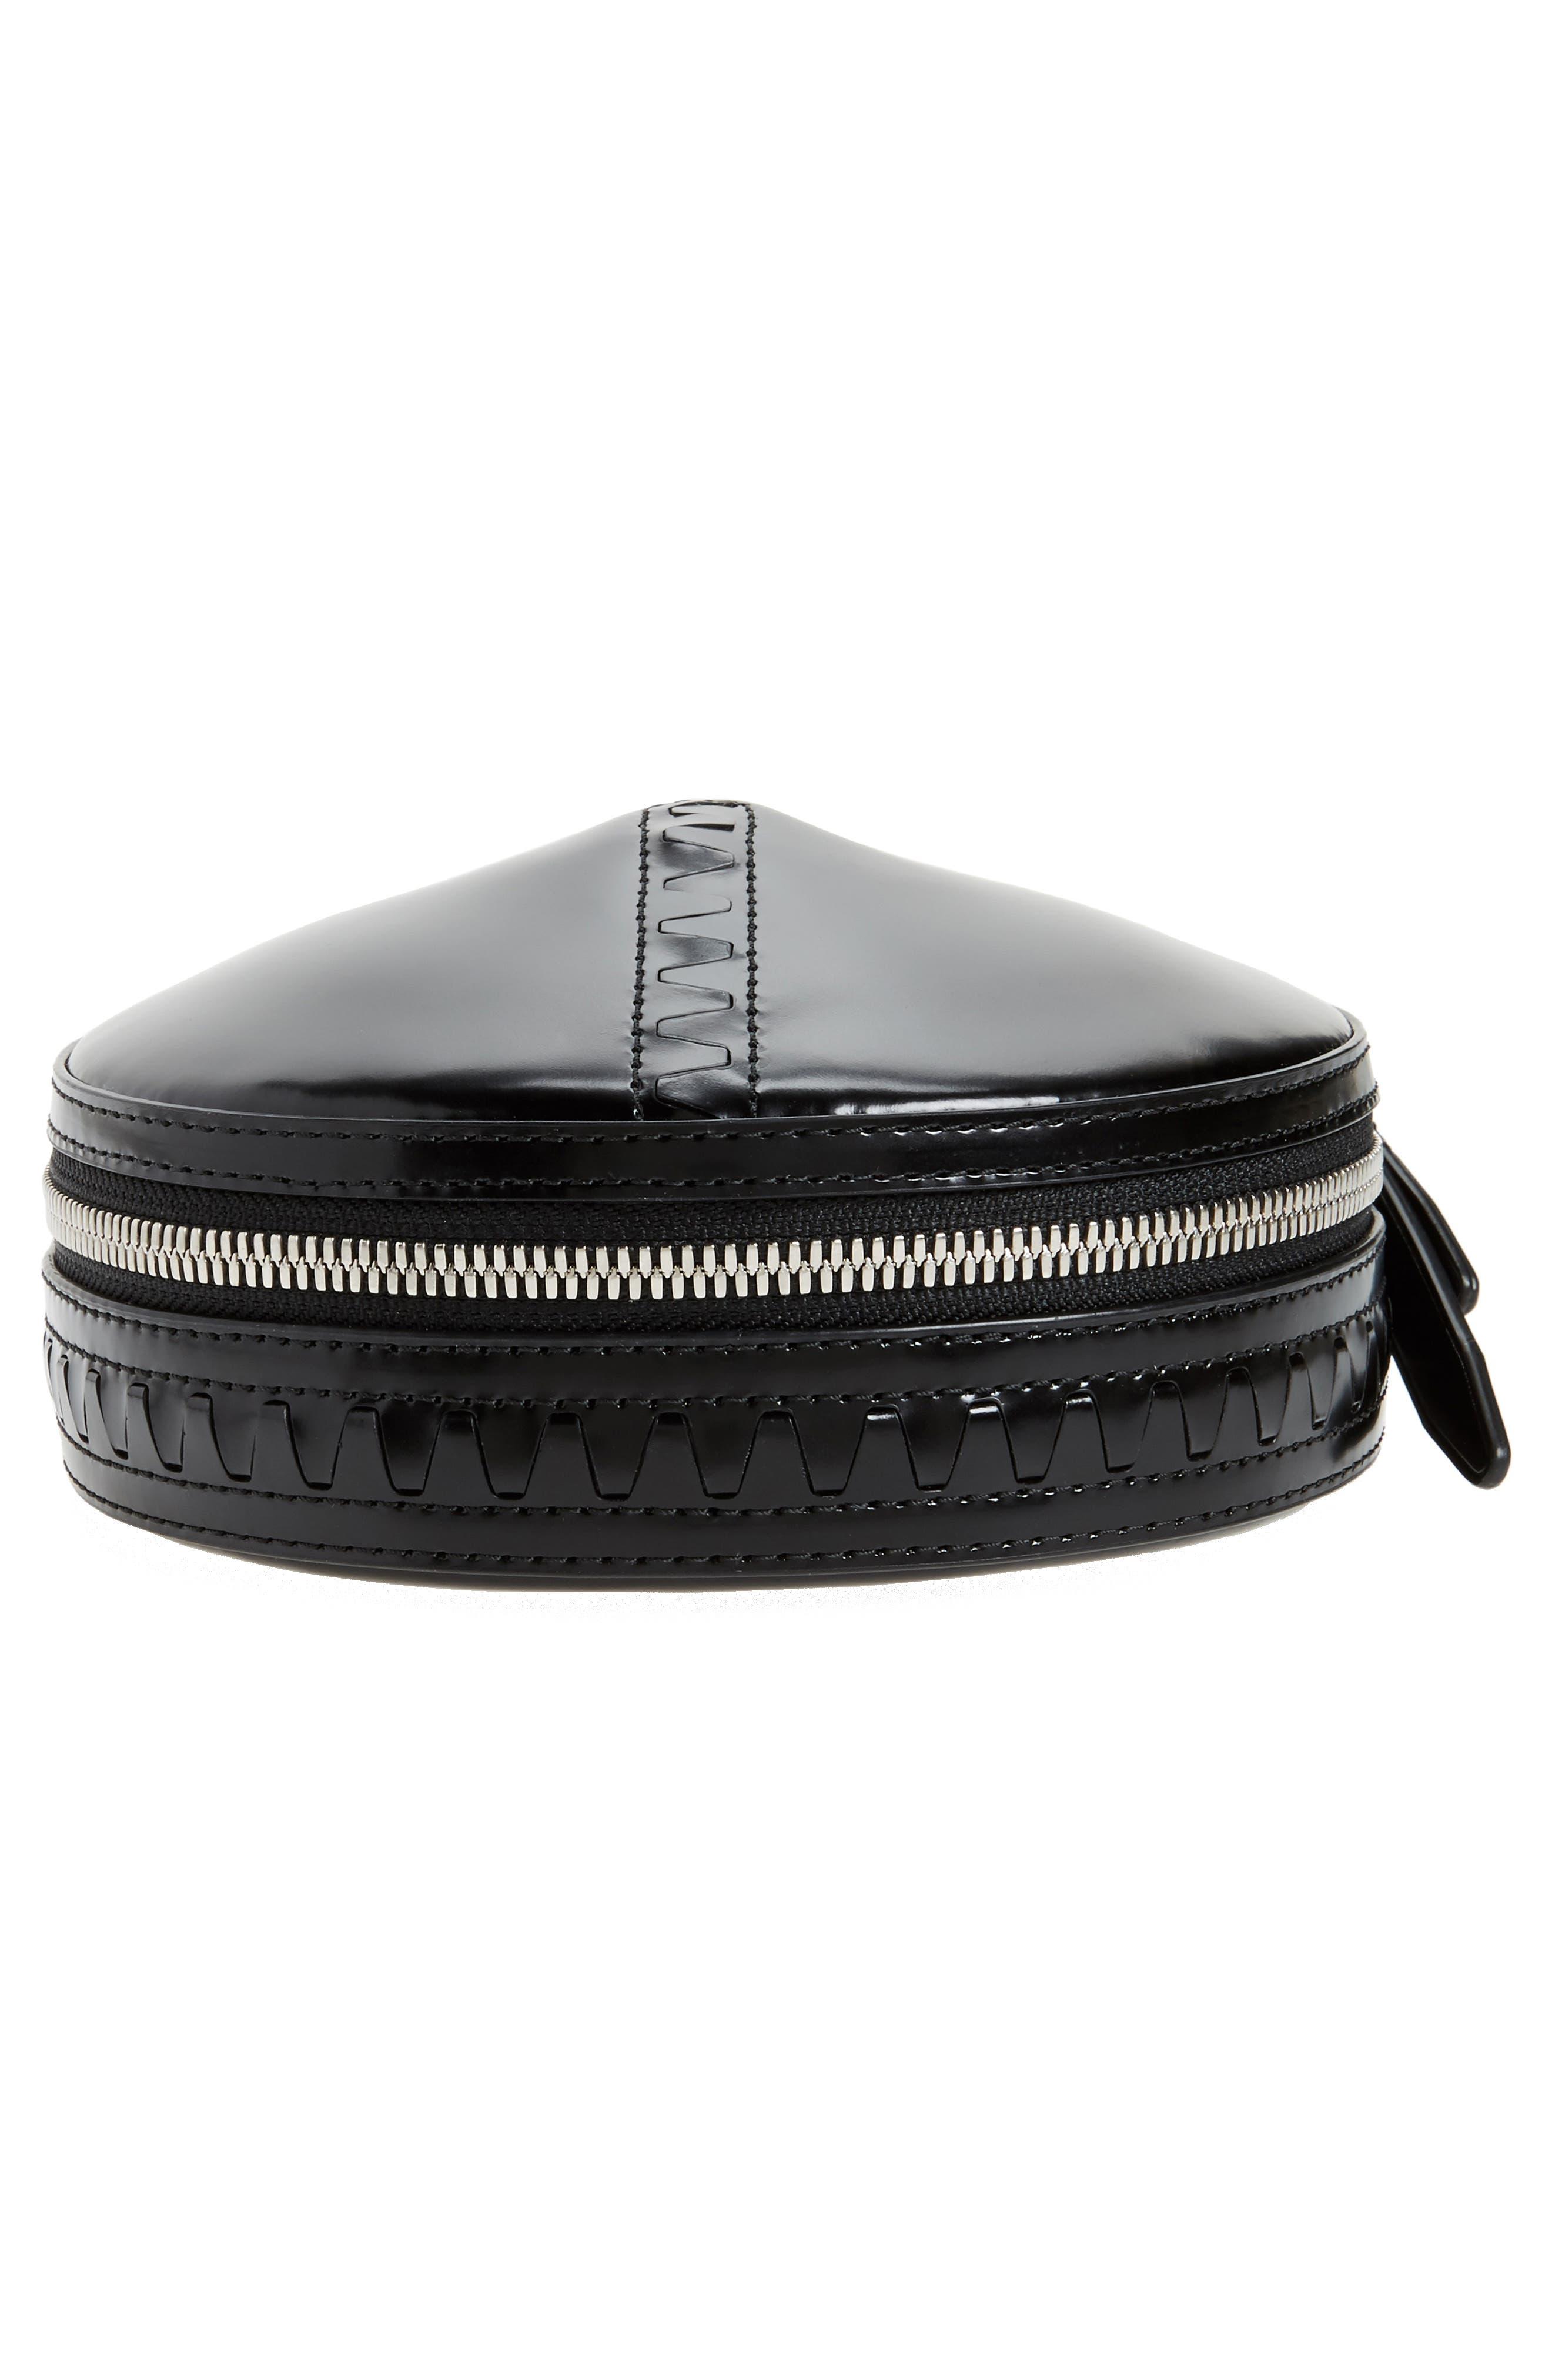 Alix Leather Circle Clutch,                             Alternate thumbnail 6, color,                             Black